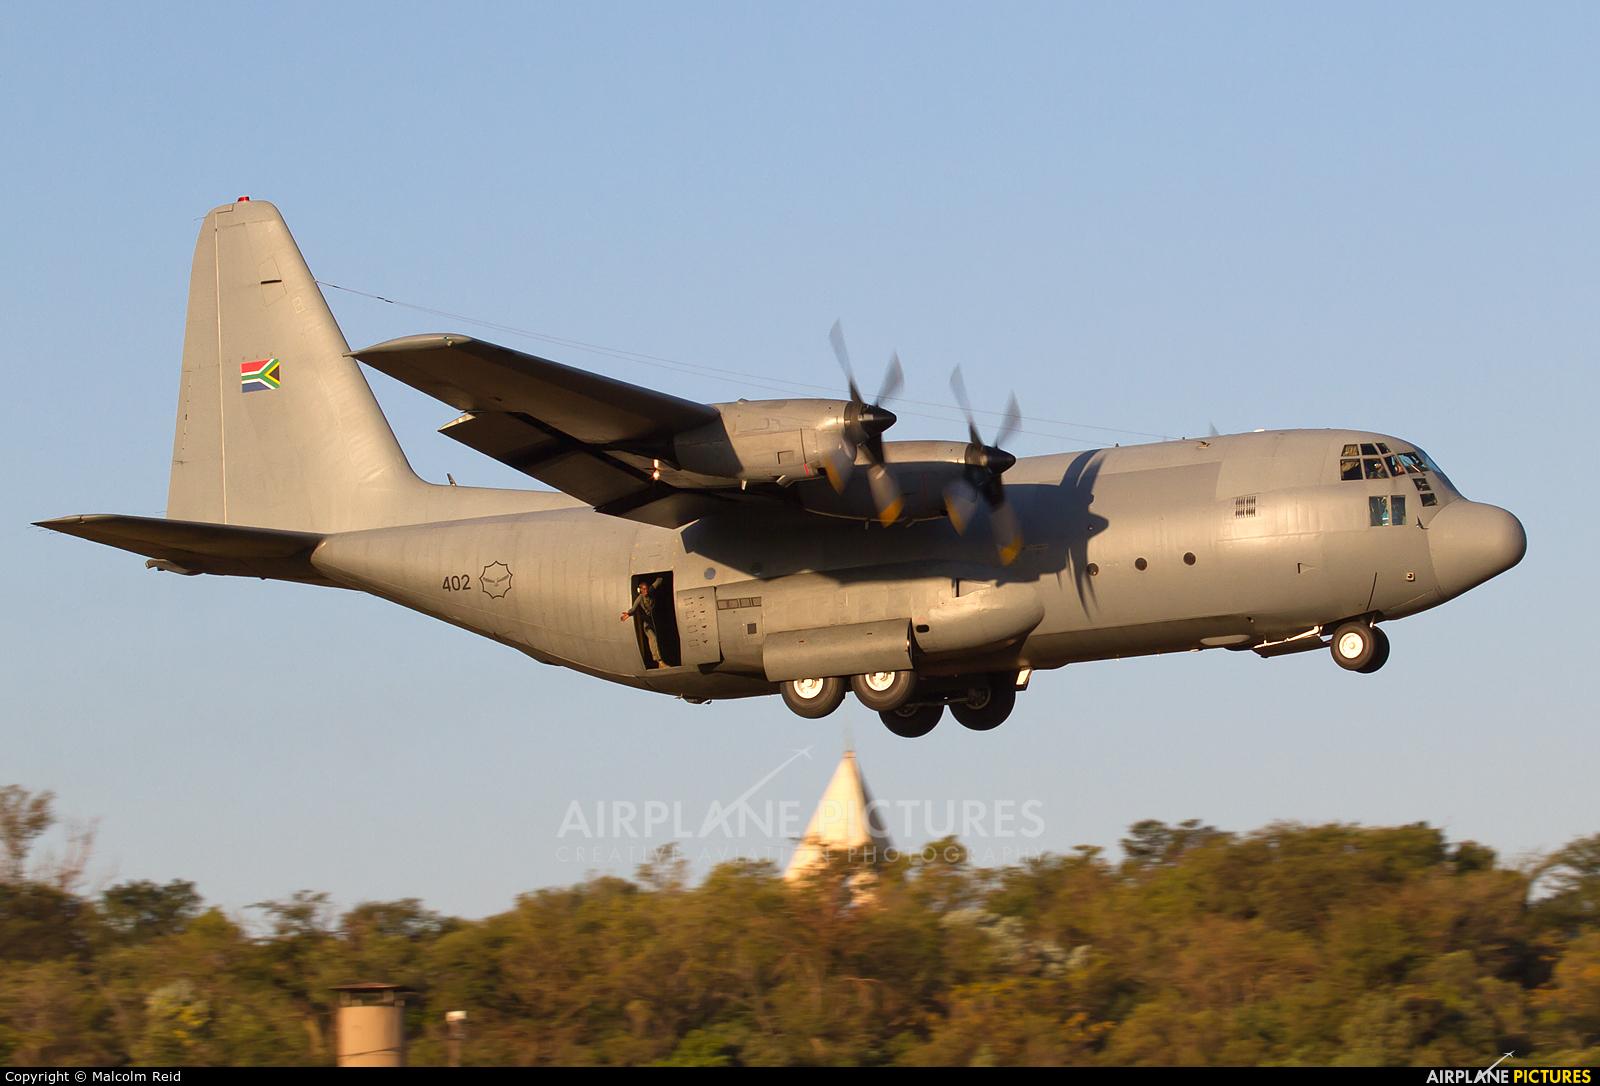 South Africa - Air Force 402 aircraft at Swartkops